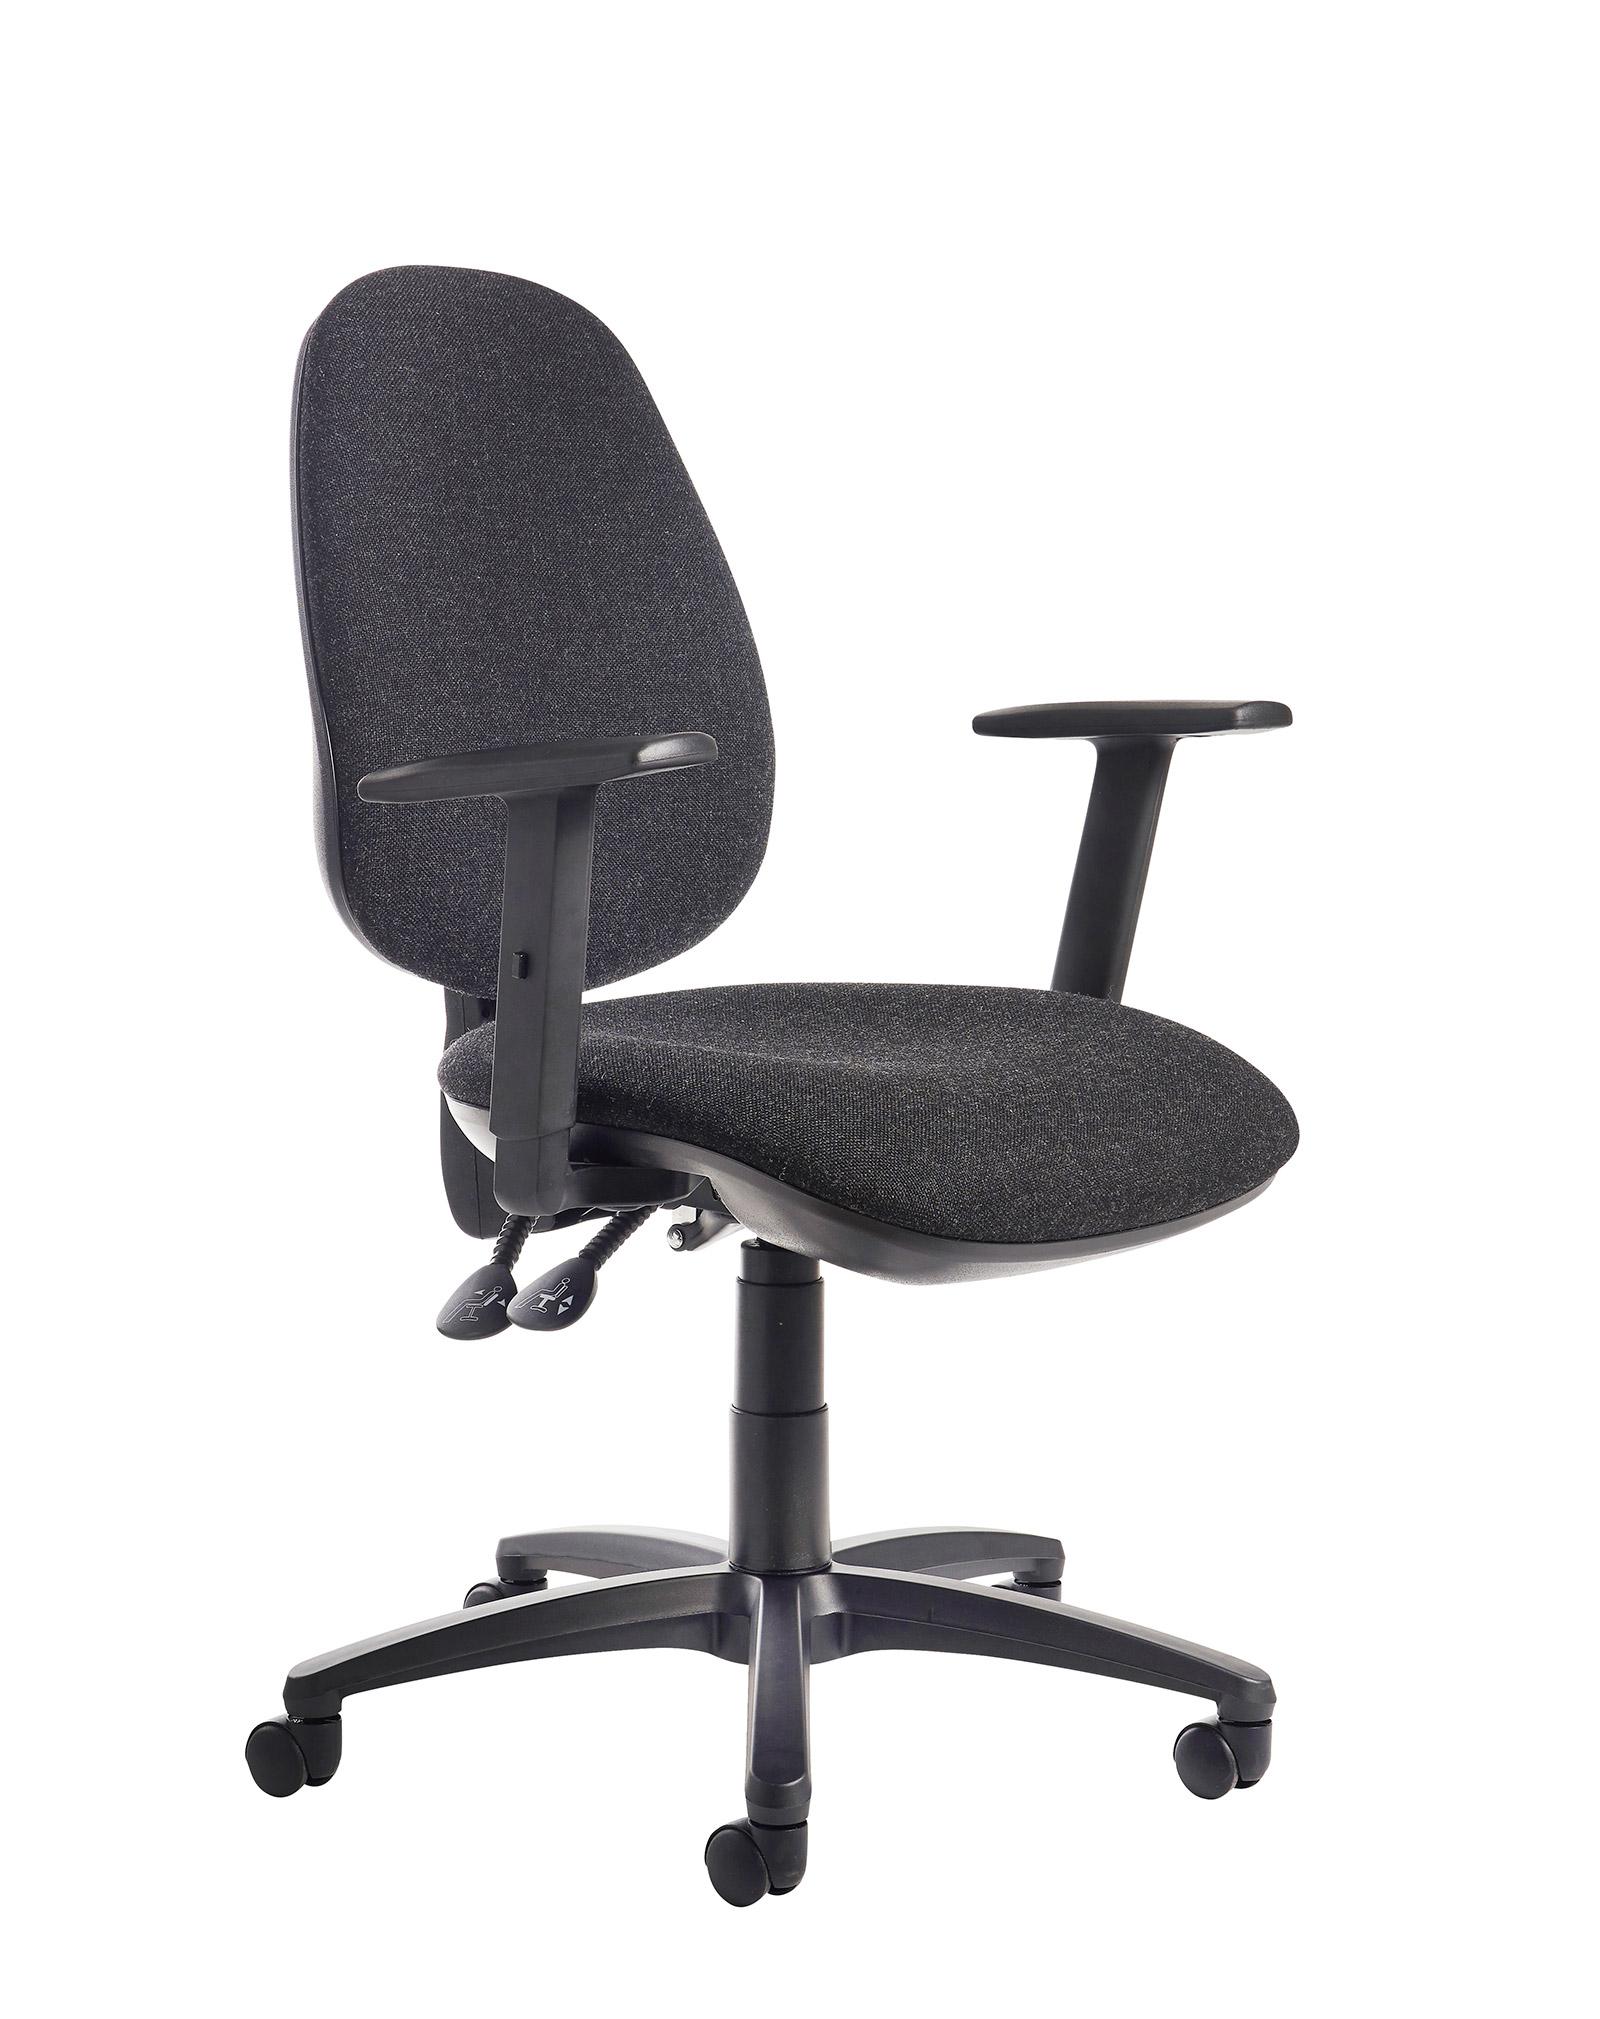 Jota high back operator chair with adjustable arms - charcoal